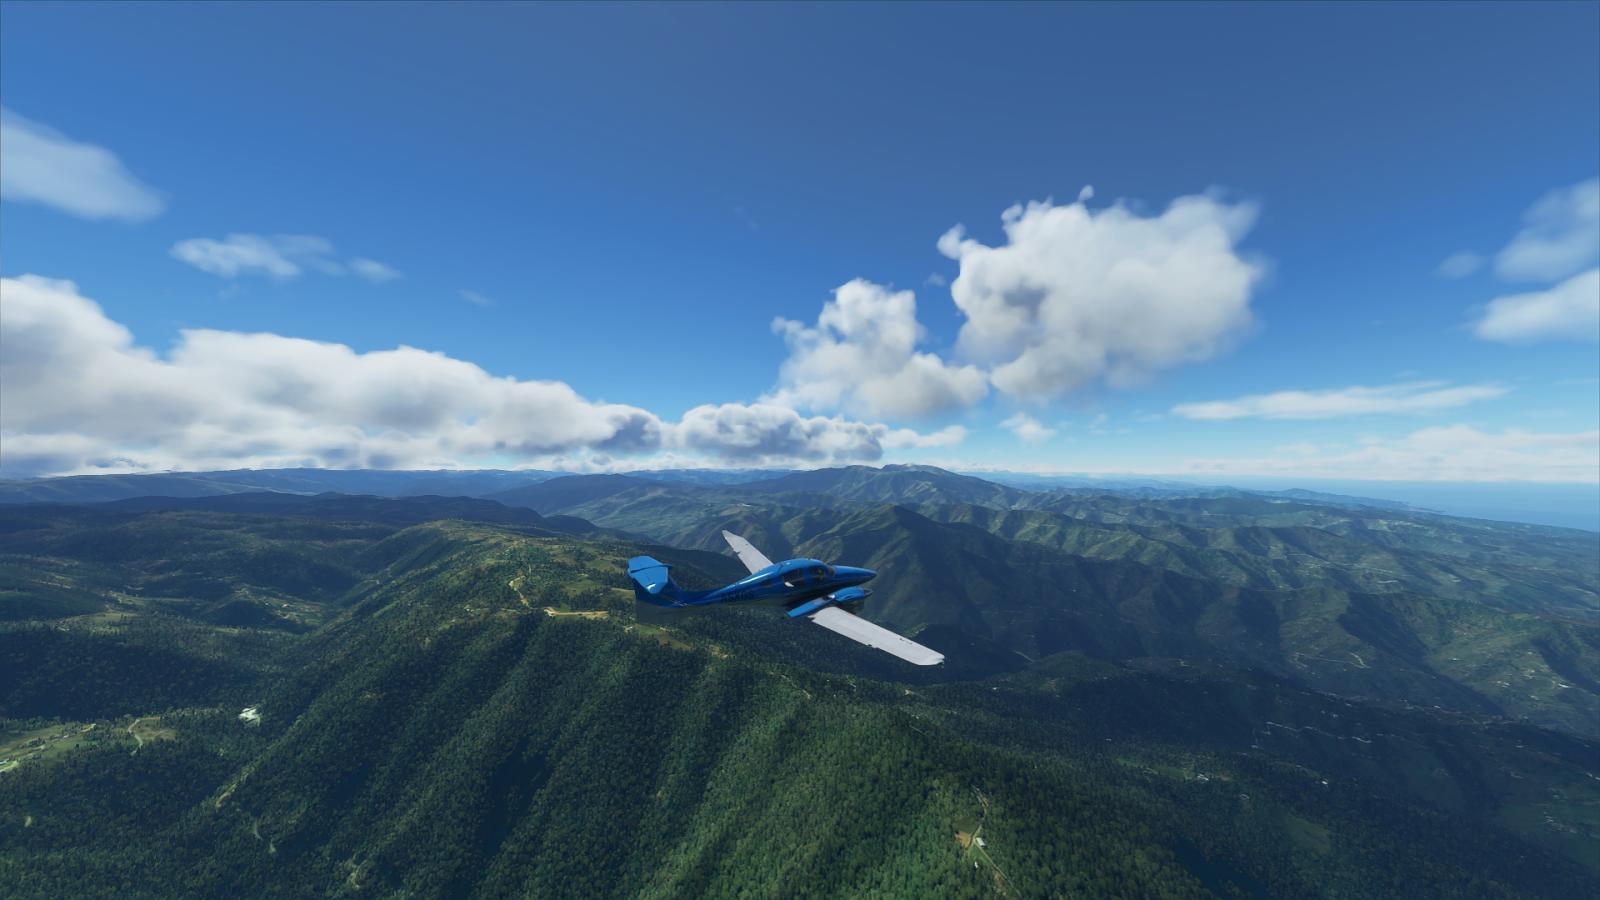 İsim:  Microsoft Flight Simulator Screenshot 2020.08.21 - 20.10.33.08.jpg Görüntüleme: 122 Büyüklük:  117.7 KB (Kilobyte)